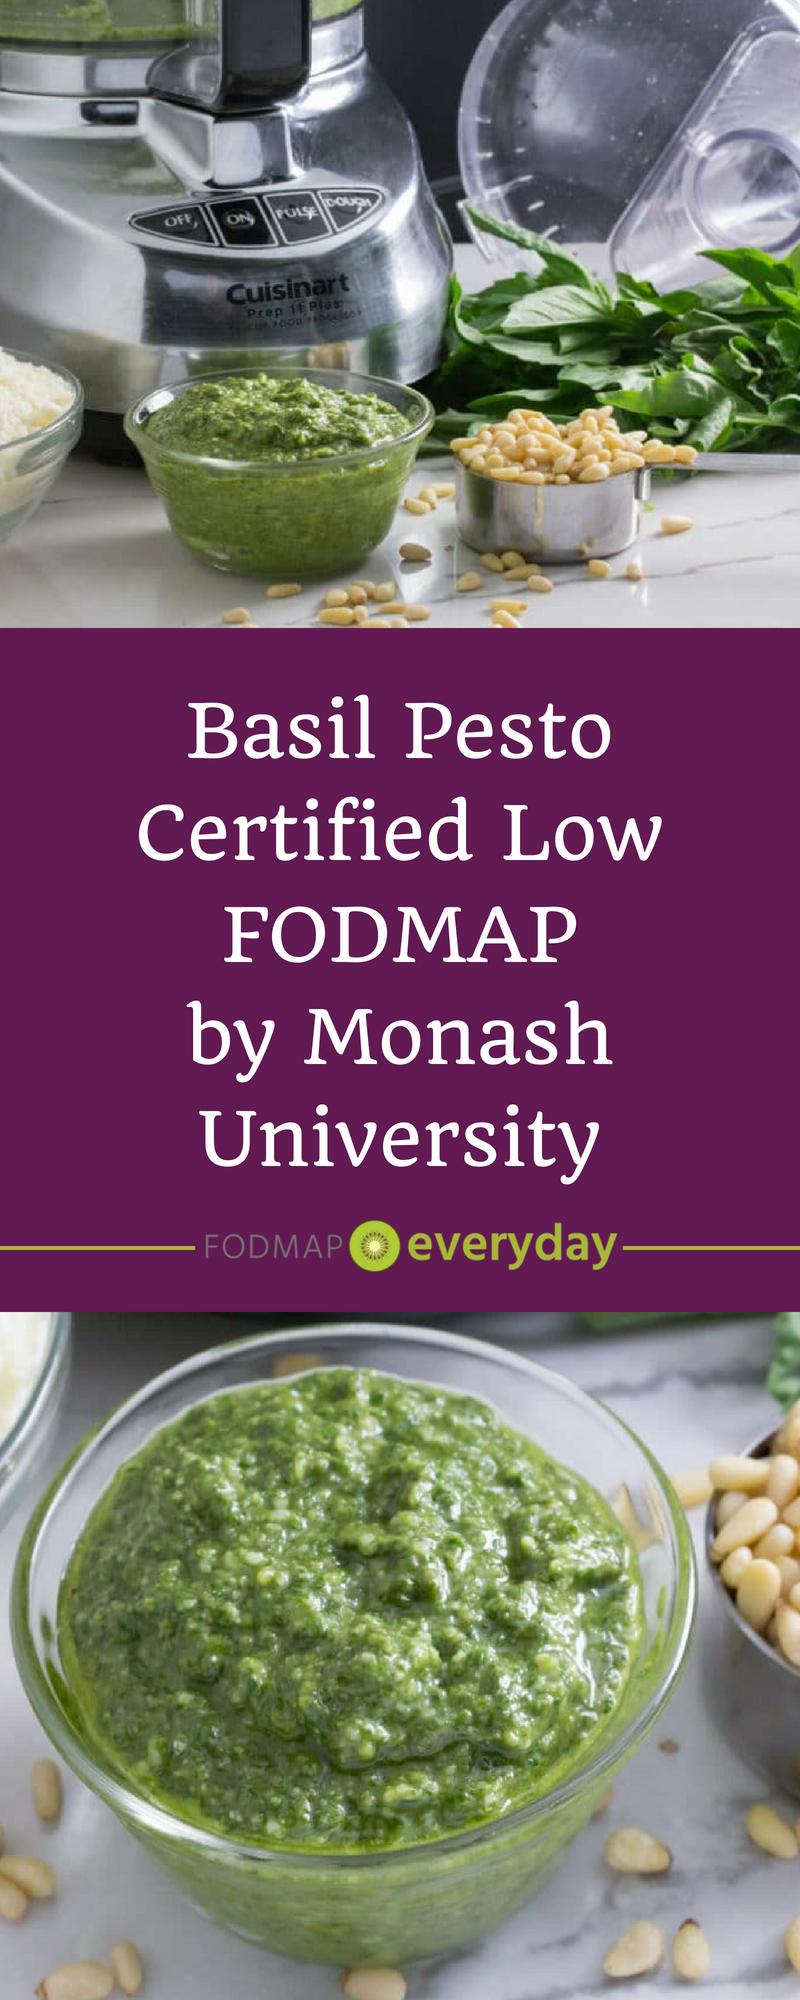 Low FODMAP Basil Pesto images